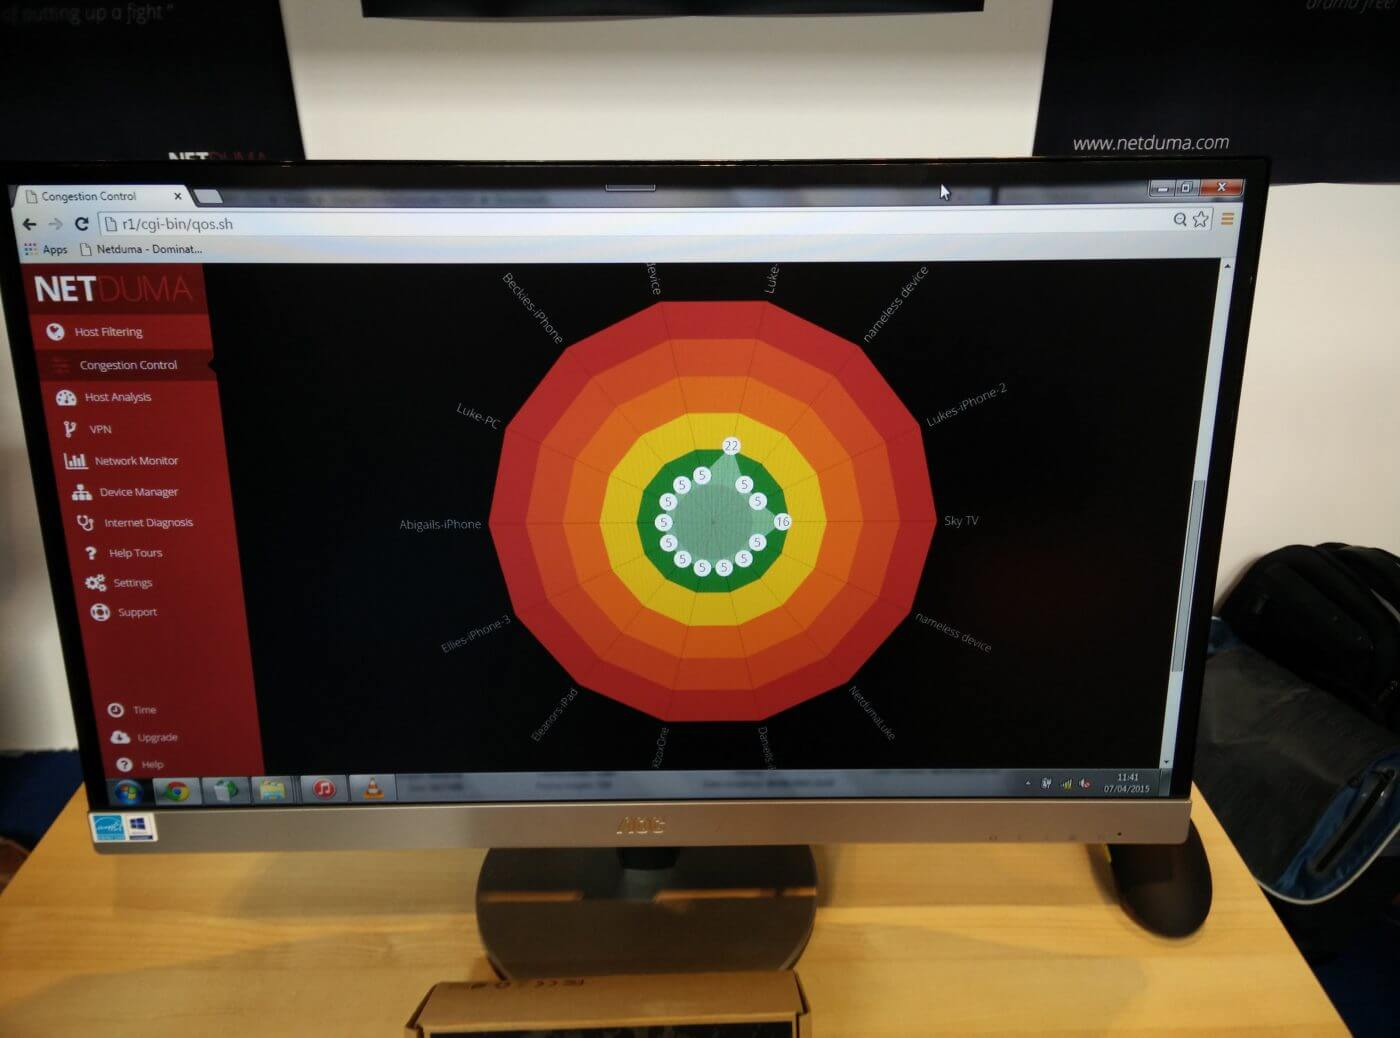 Netduma Control Software